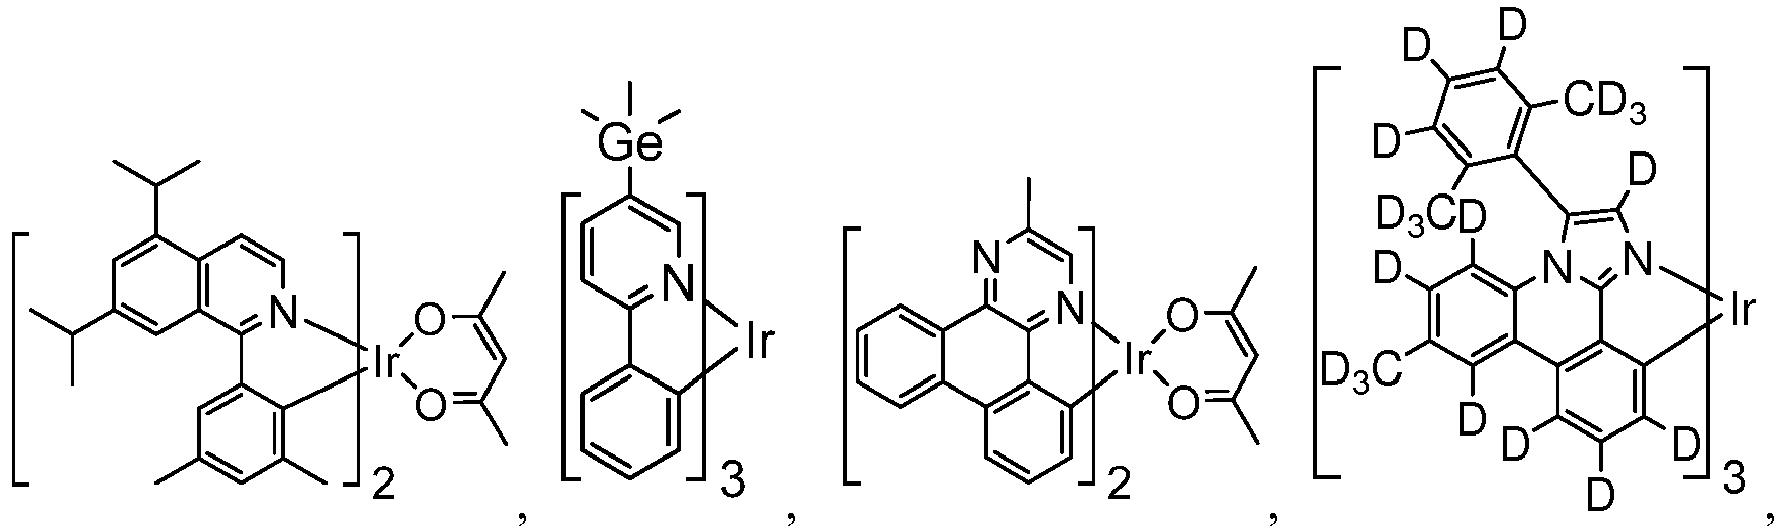 Figure imgb0923